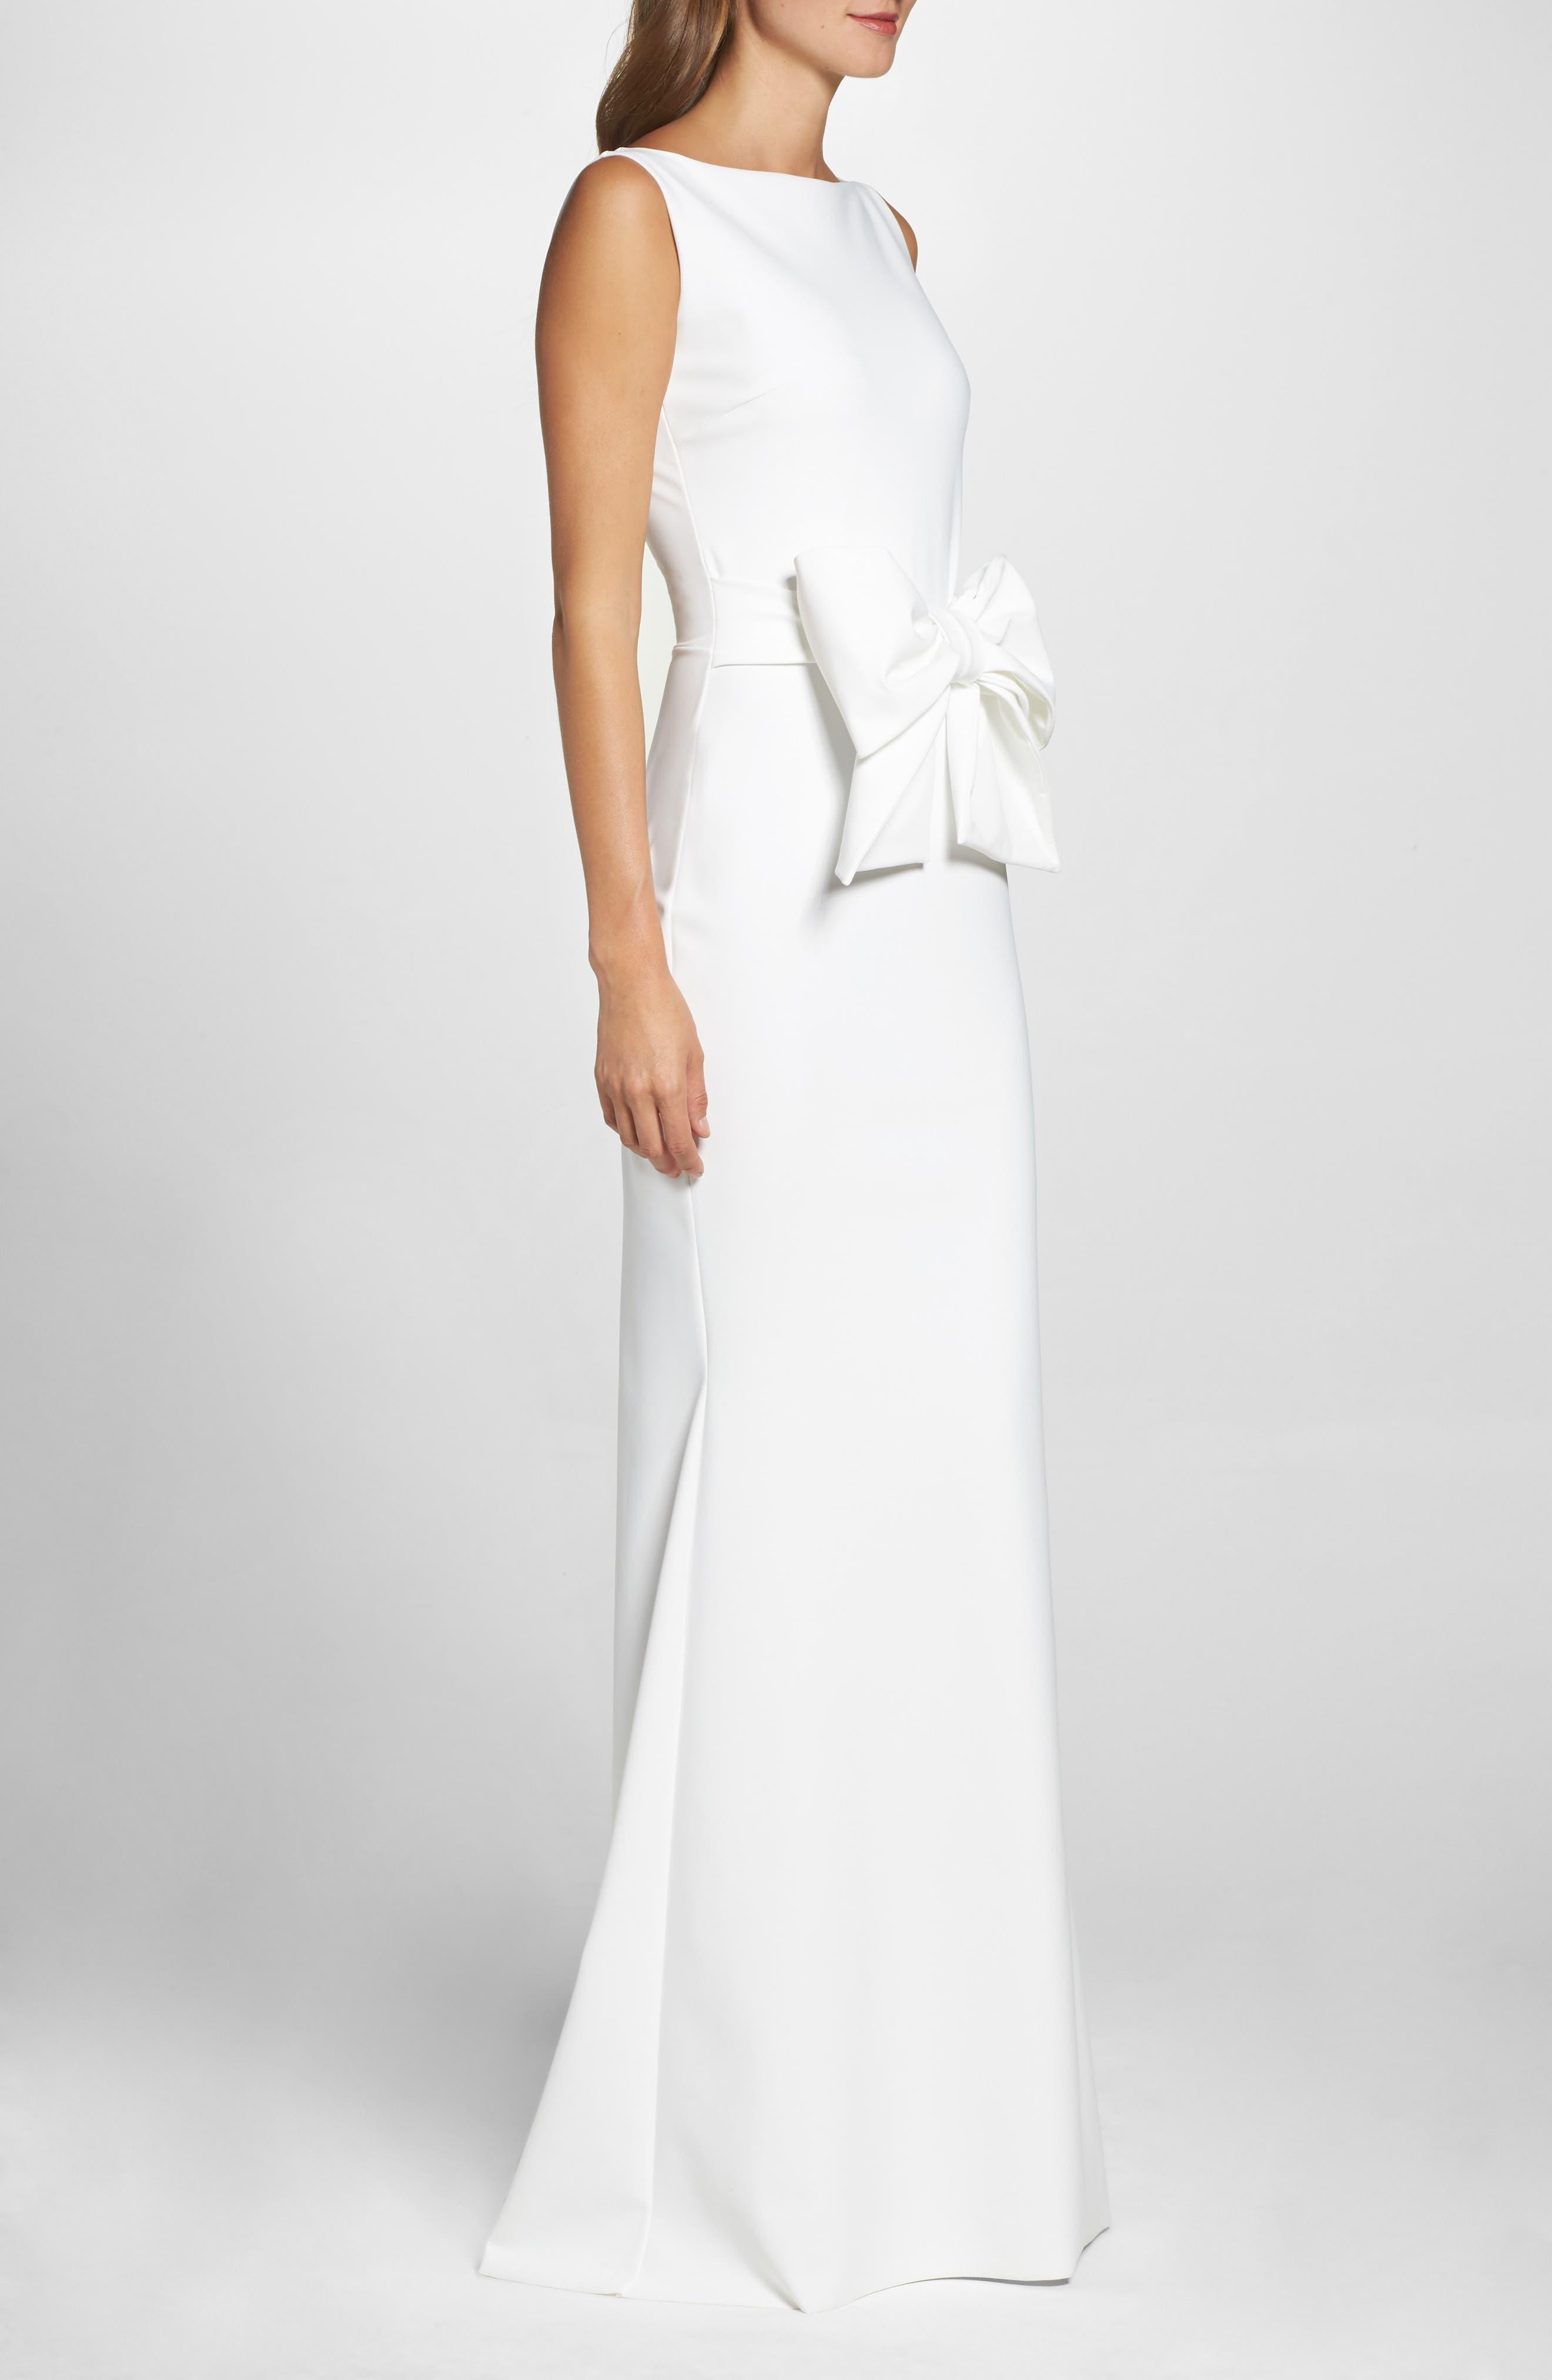 CHIARA BONI LA PETITE ROBE,                             Bow Detail Sleeveless Gown,                             Alternate thumbnail 3, color,                             100